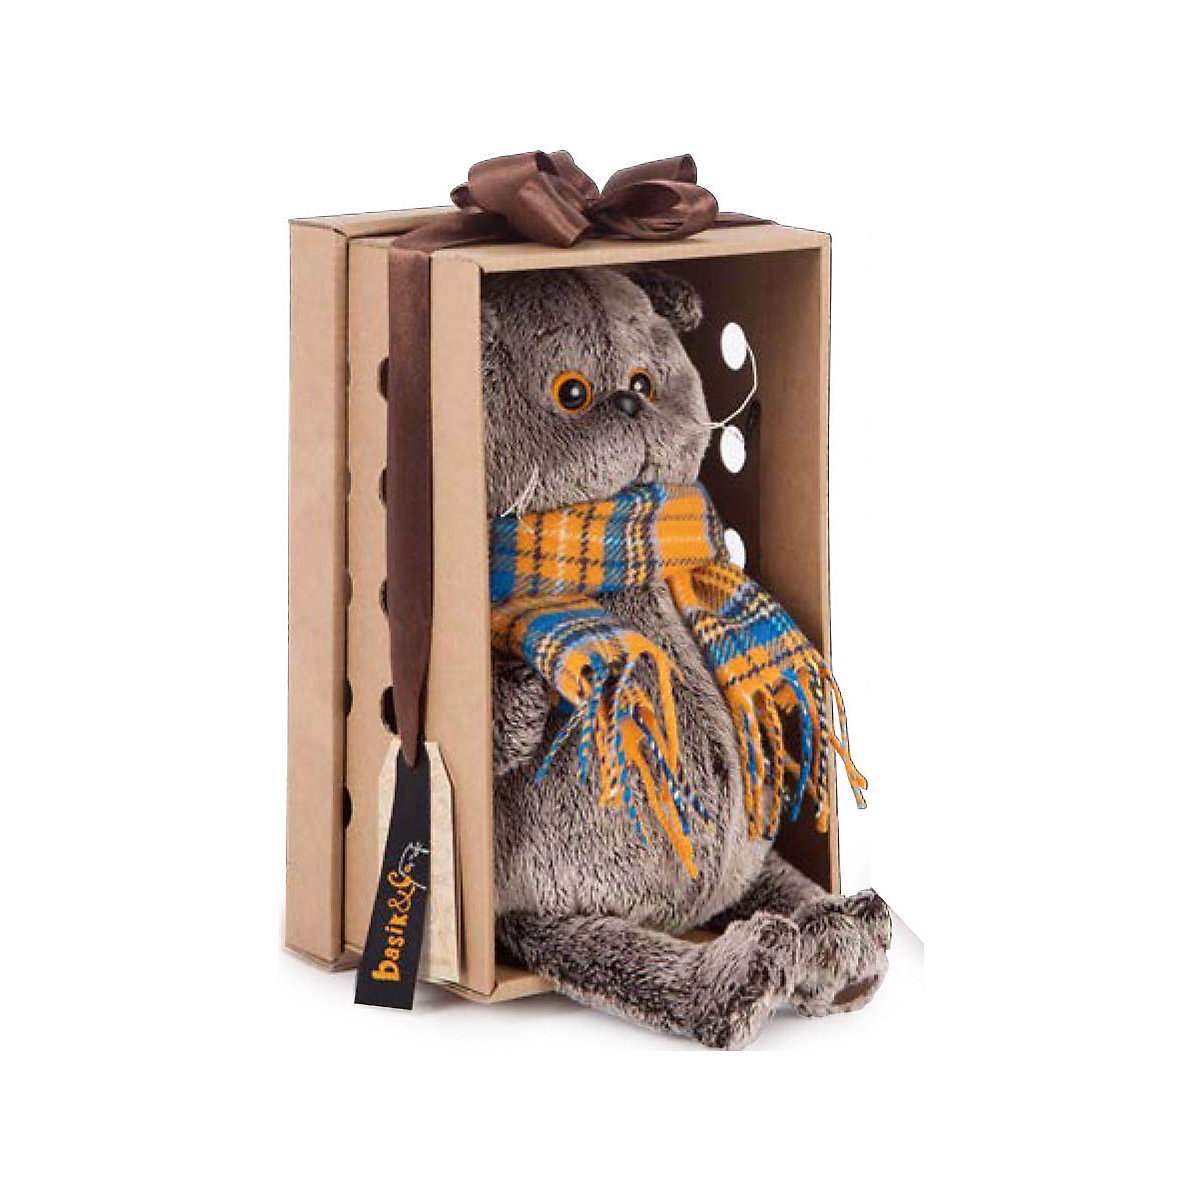 Stuffed & Plush Animals BUDI BASA 8999599 Stitch Bear Totoro Giraffe Fox Cat Dog Soft Children's toys - 4